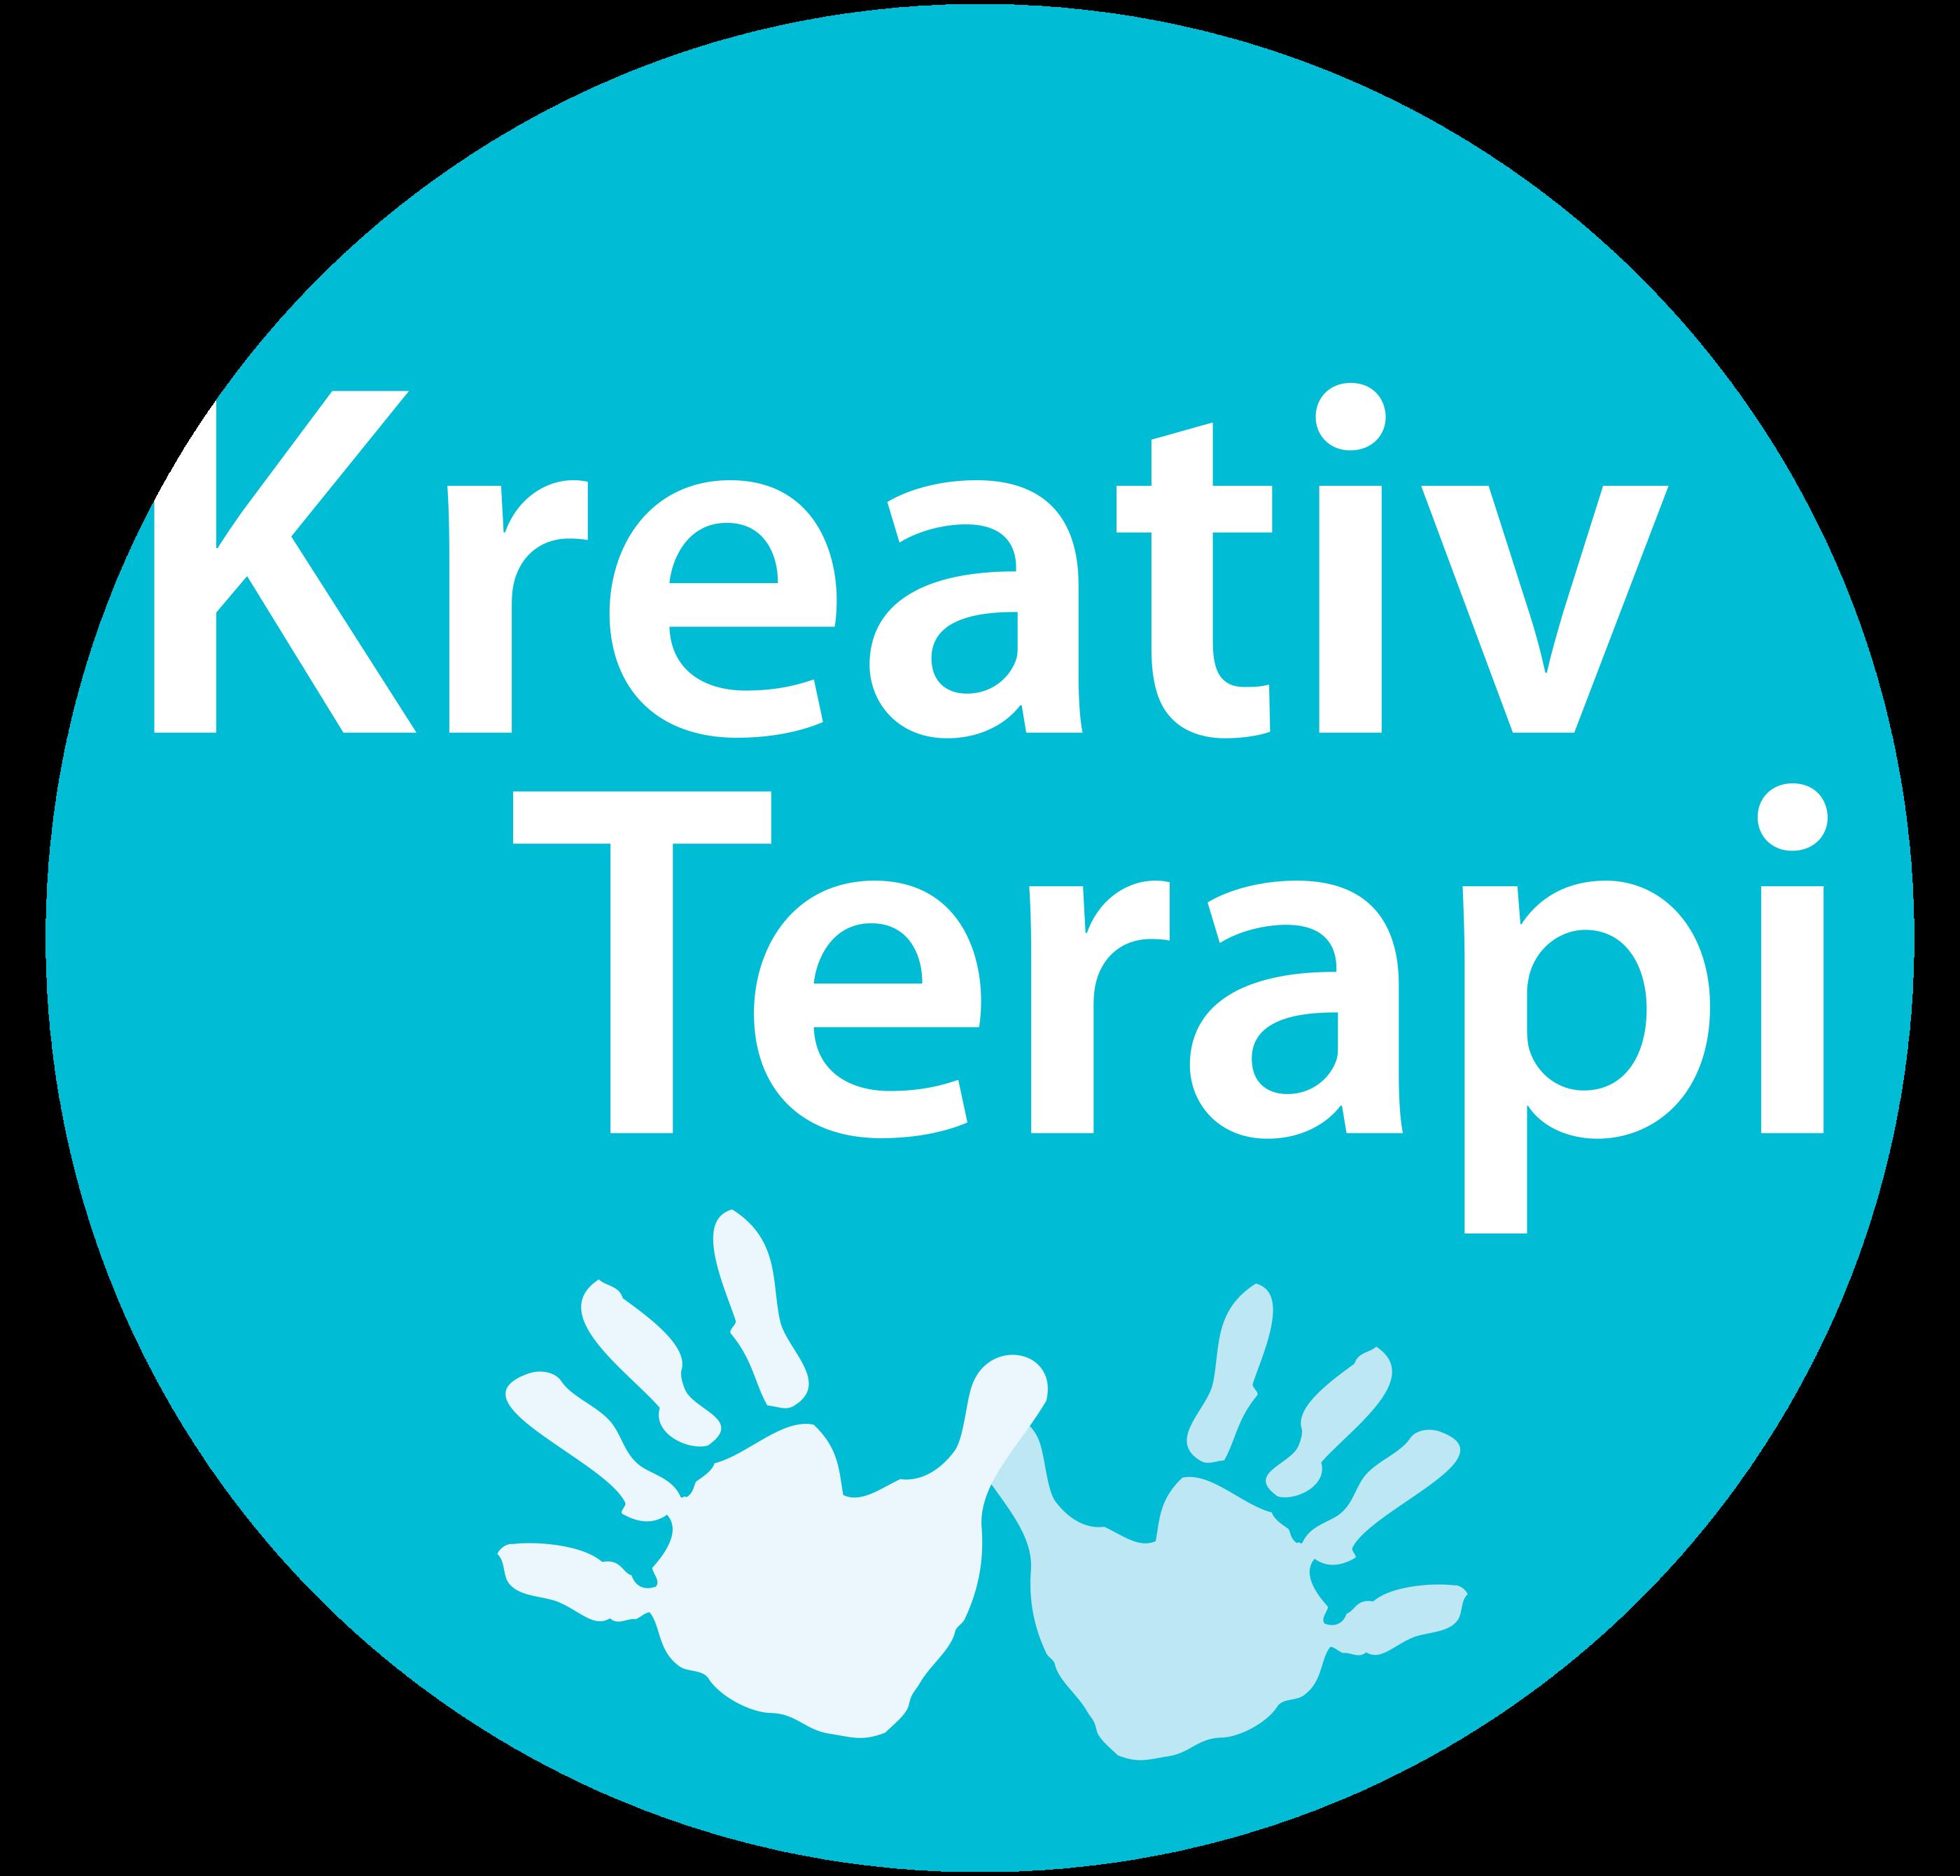 Kreativ_Terapi varmare